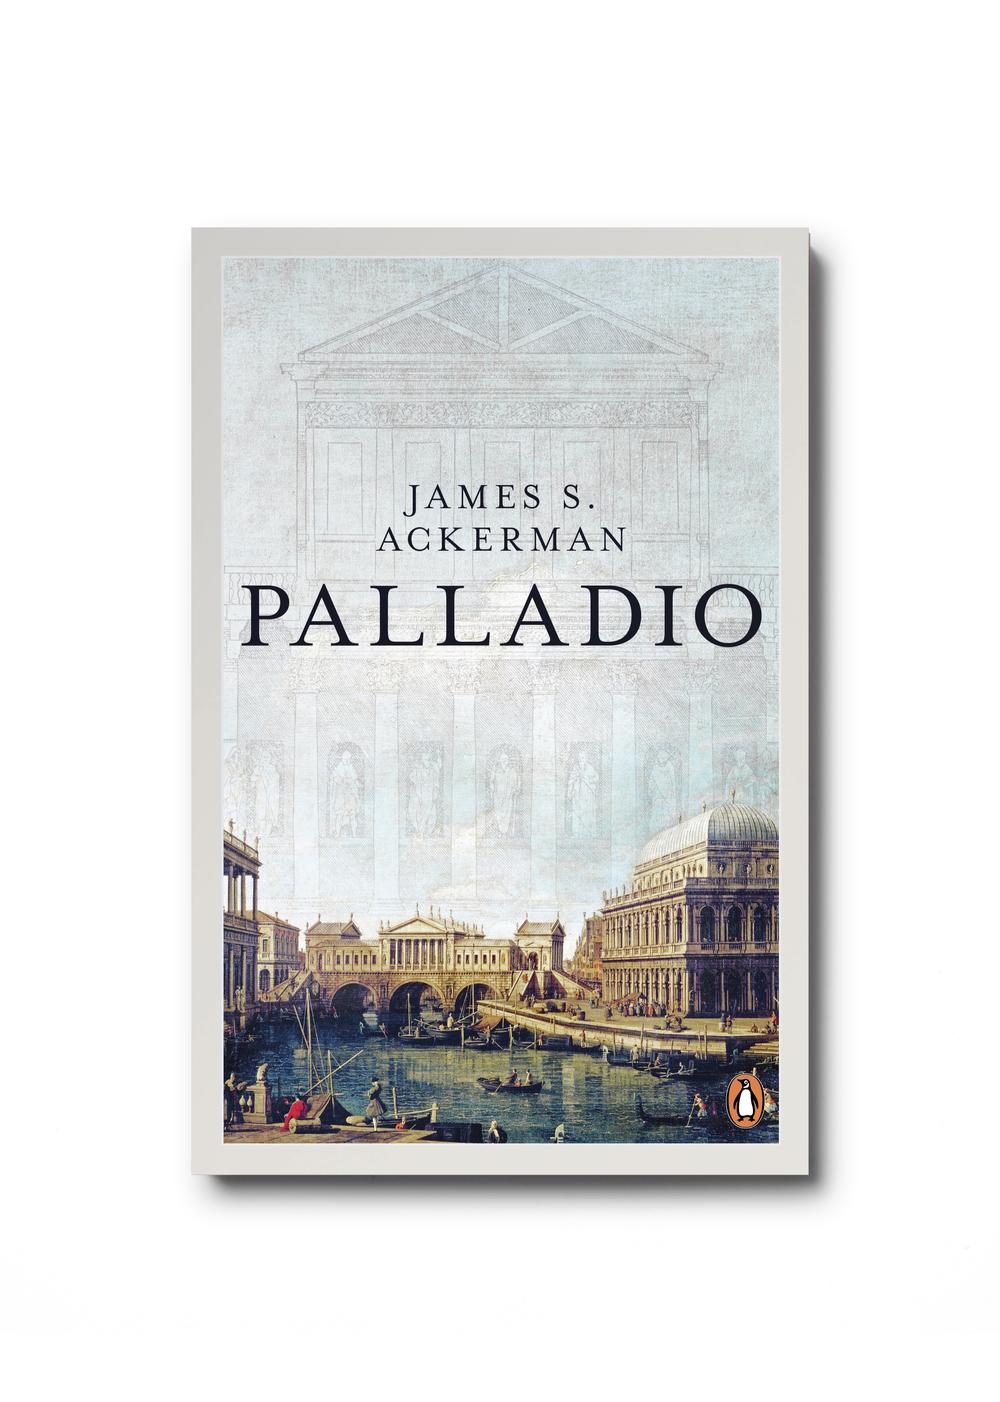 Palladio by James S. Ackerman - Design: Jim Stoddart